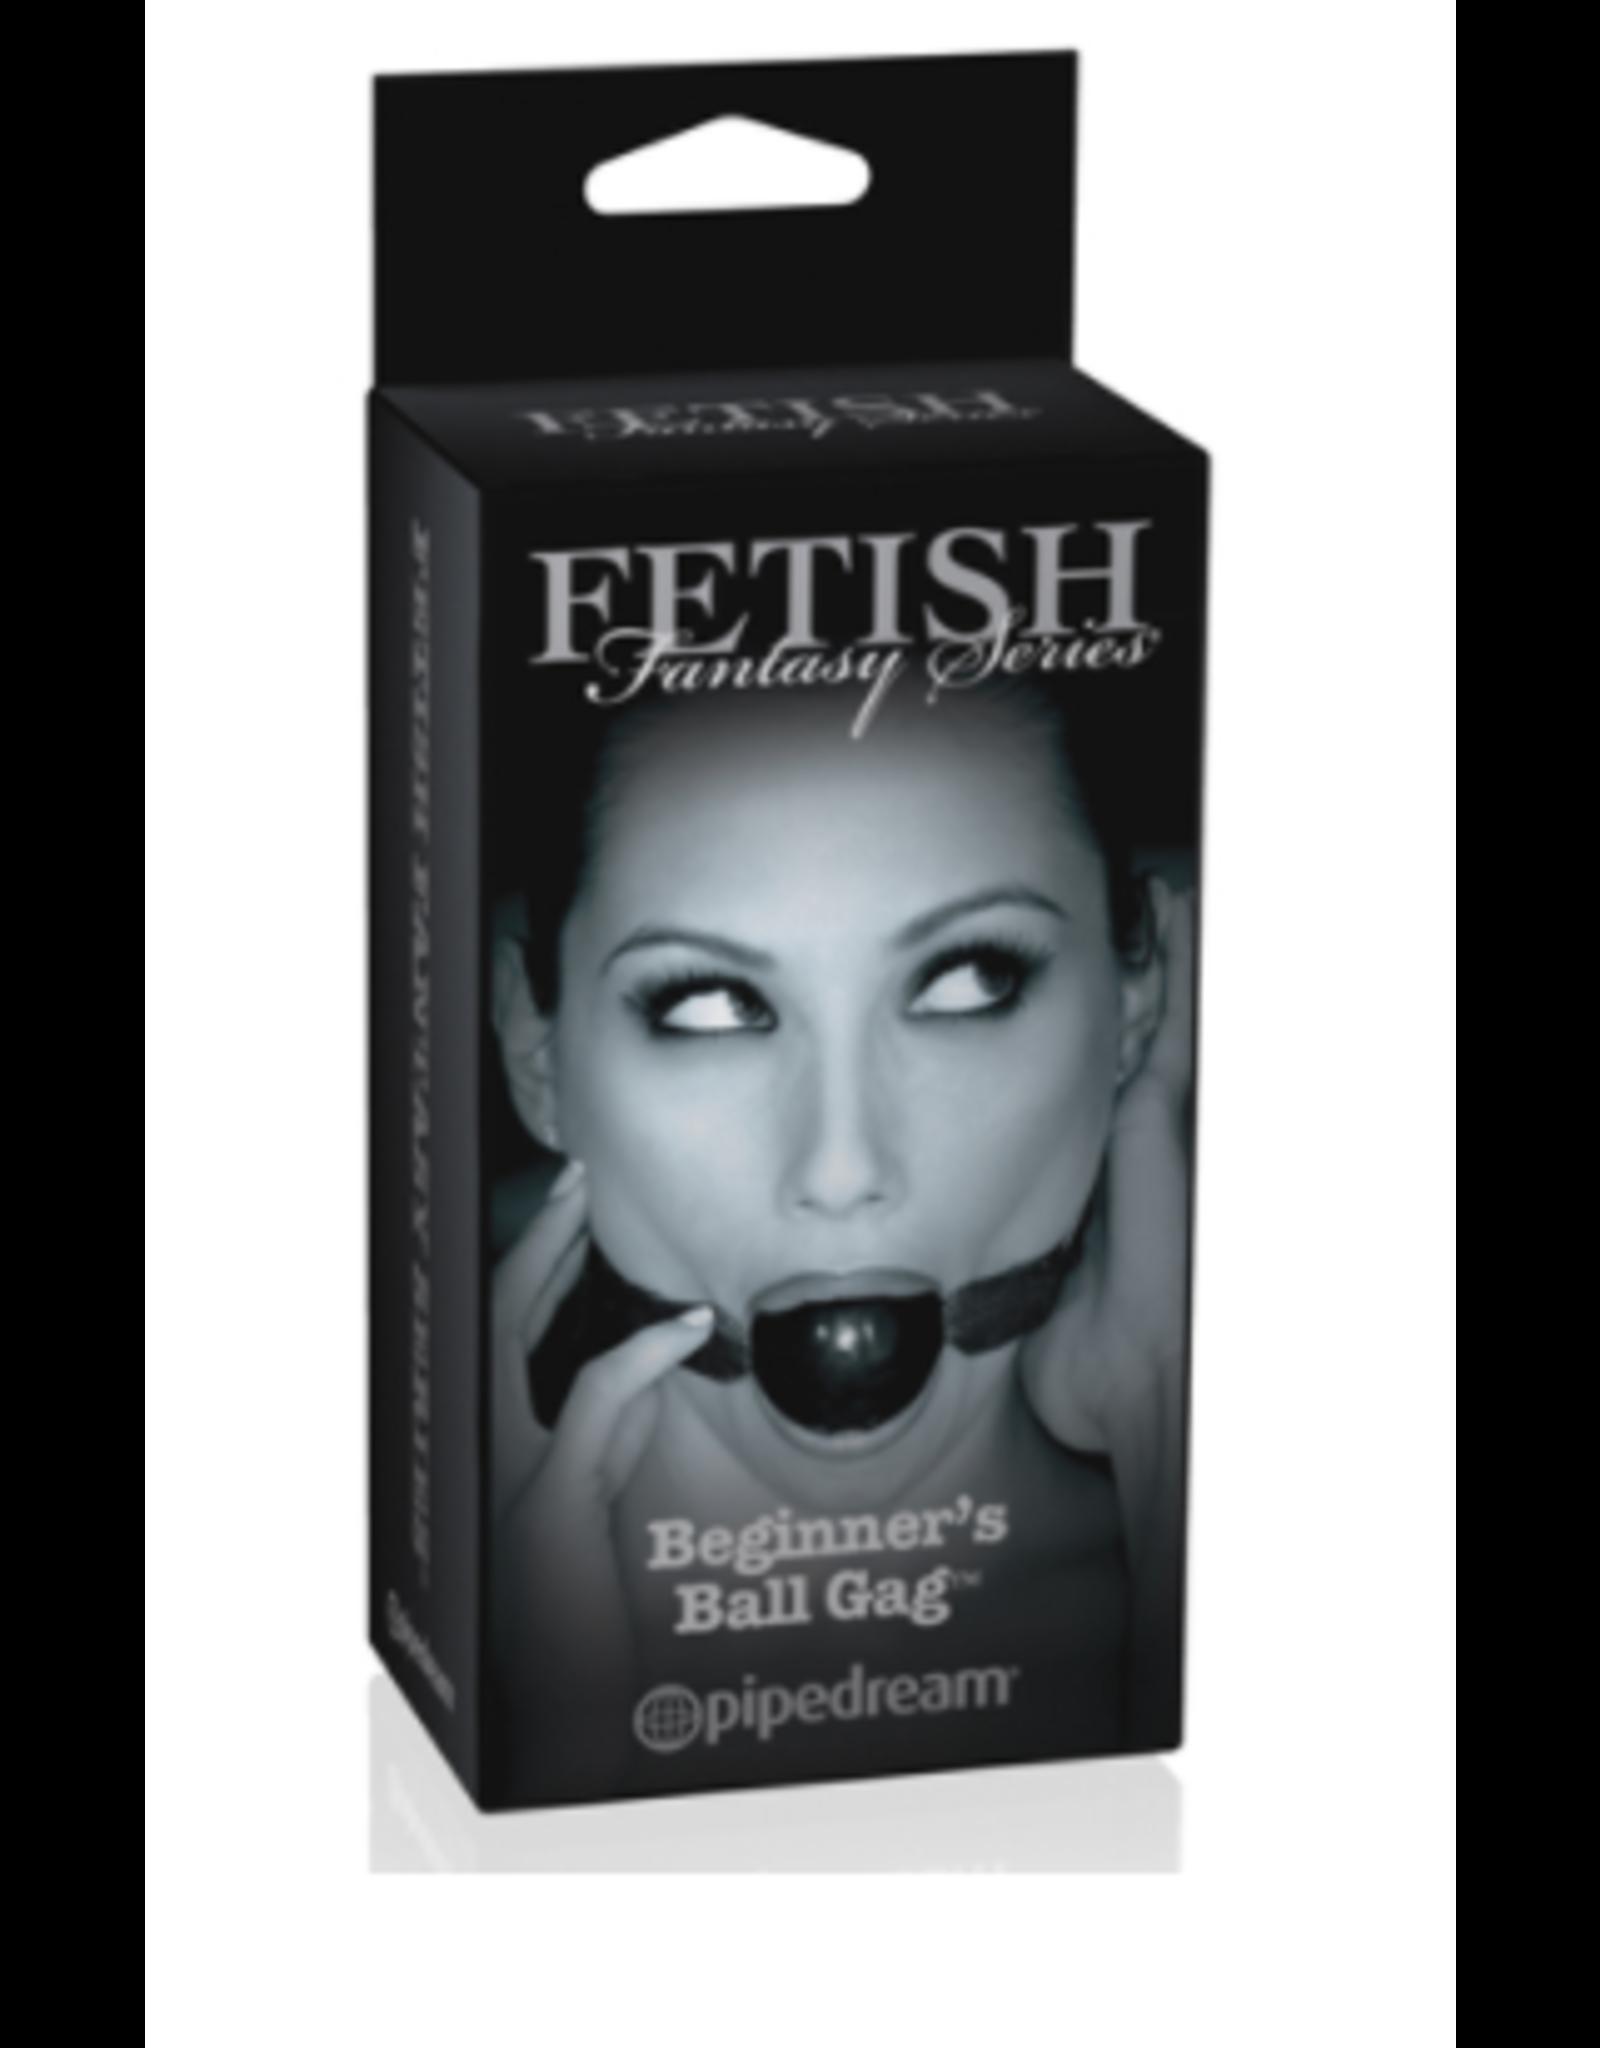 Fetish Fantasy Limited Edition Beginners Ball Gag